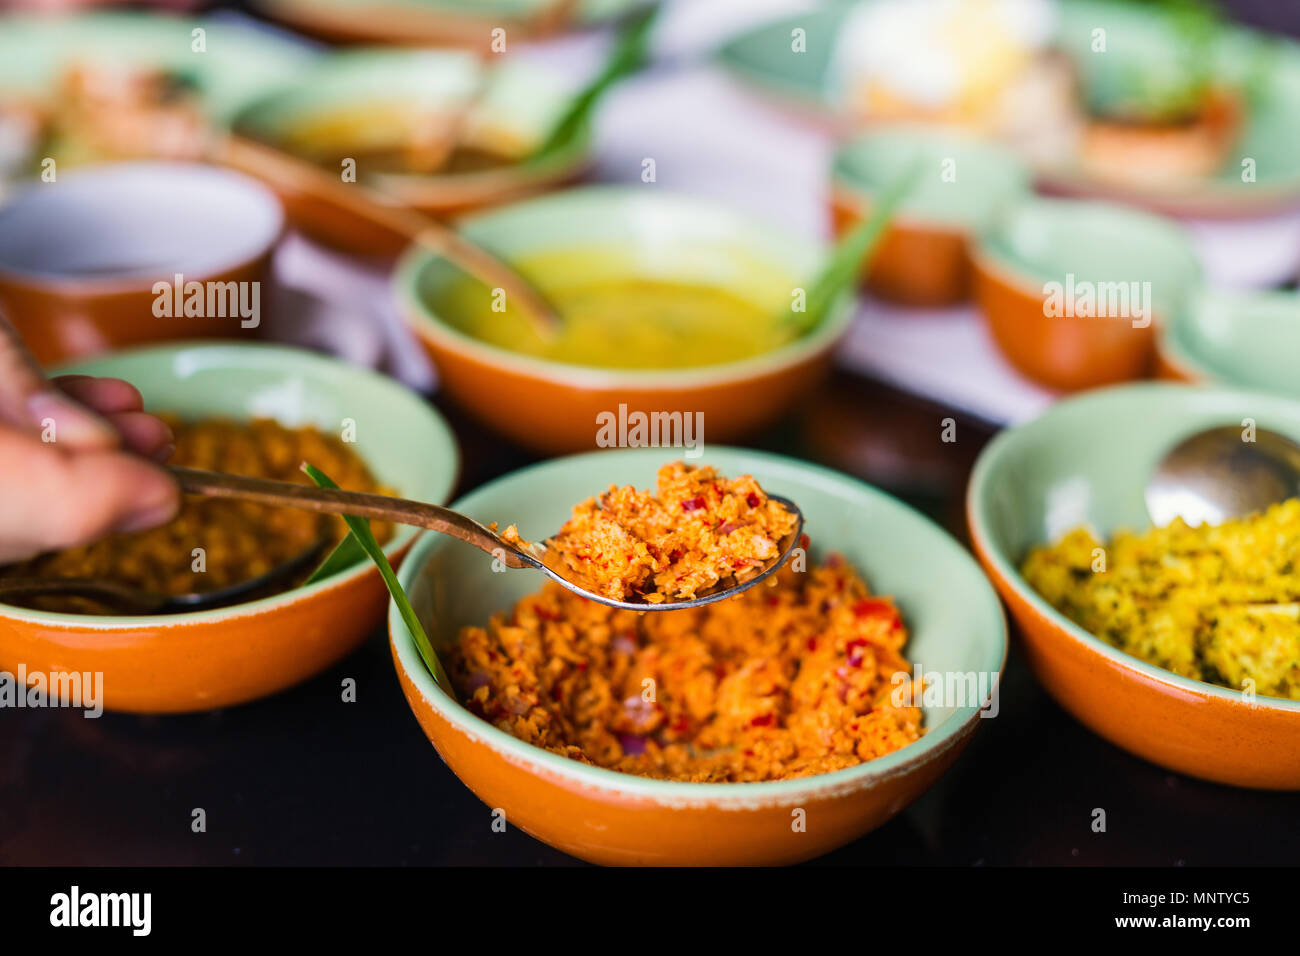 Coconut sambal de cerca en la mesa con alimentos de Sri Lanka Imagen De Stock